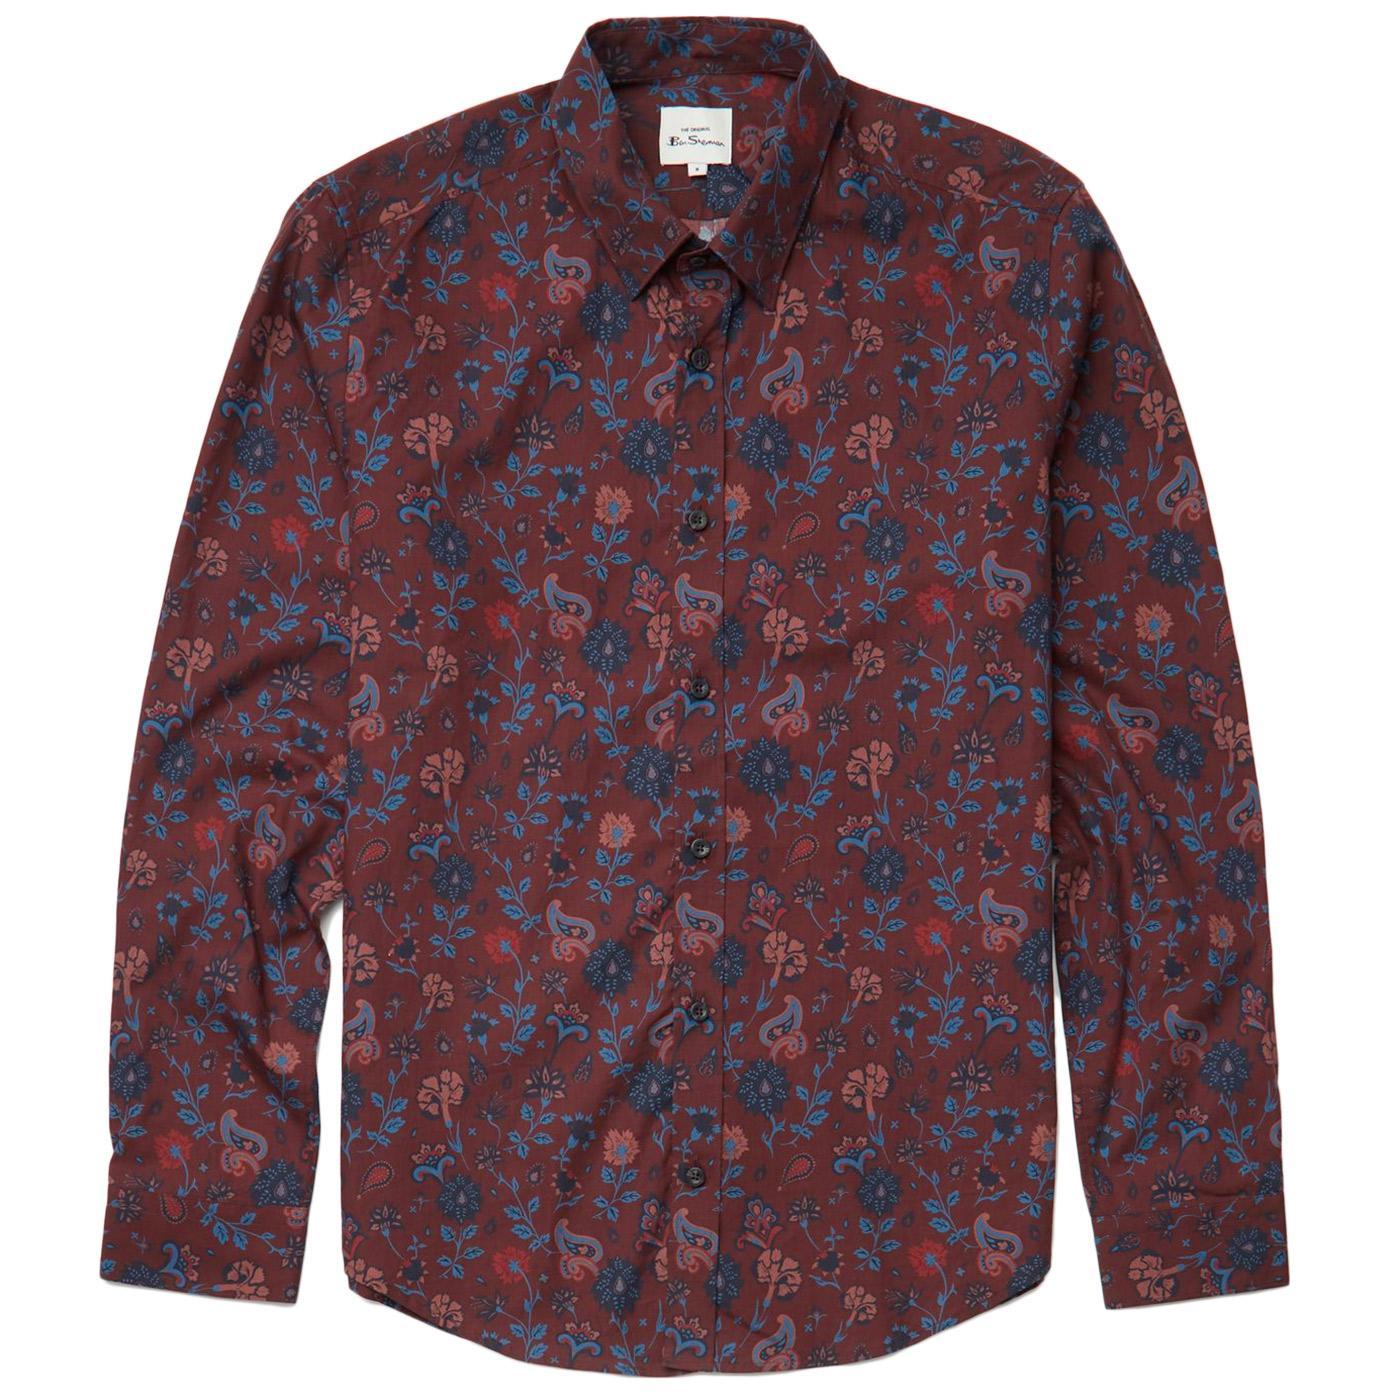 Retro Floral BEN SHERMAN Mod Paisley Shirt (Bordo)